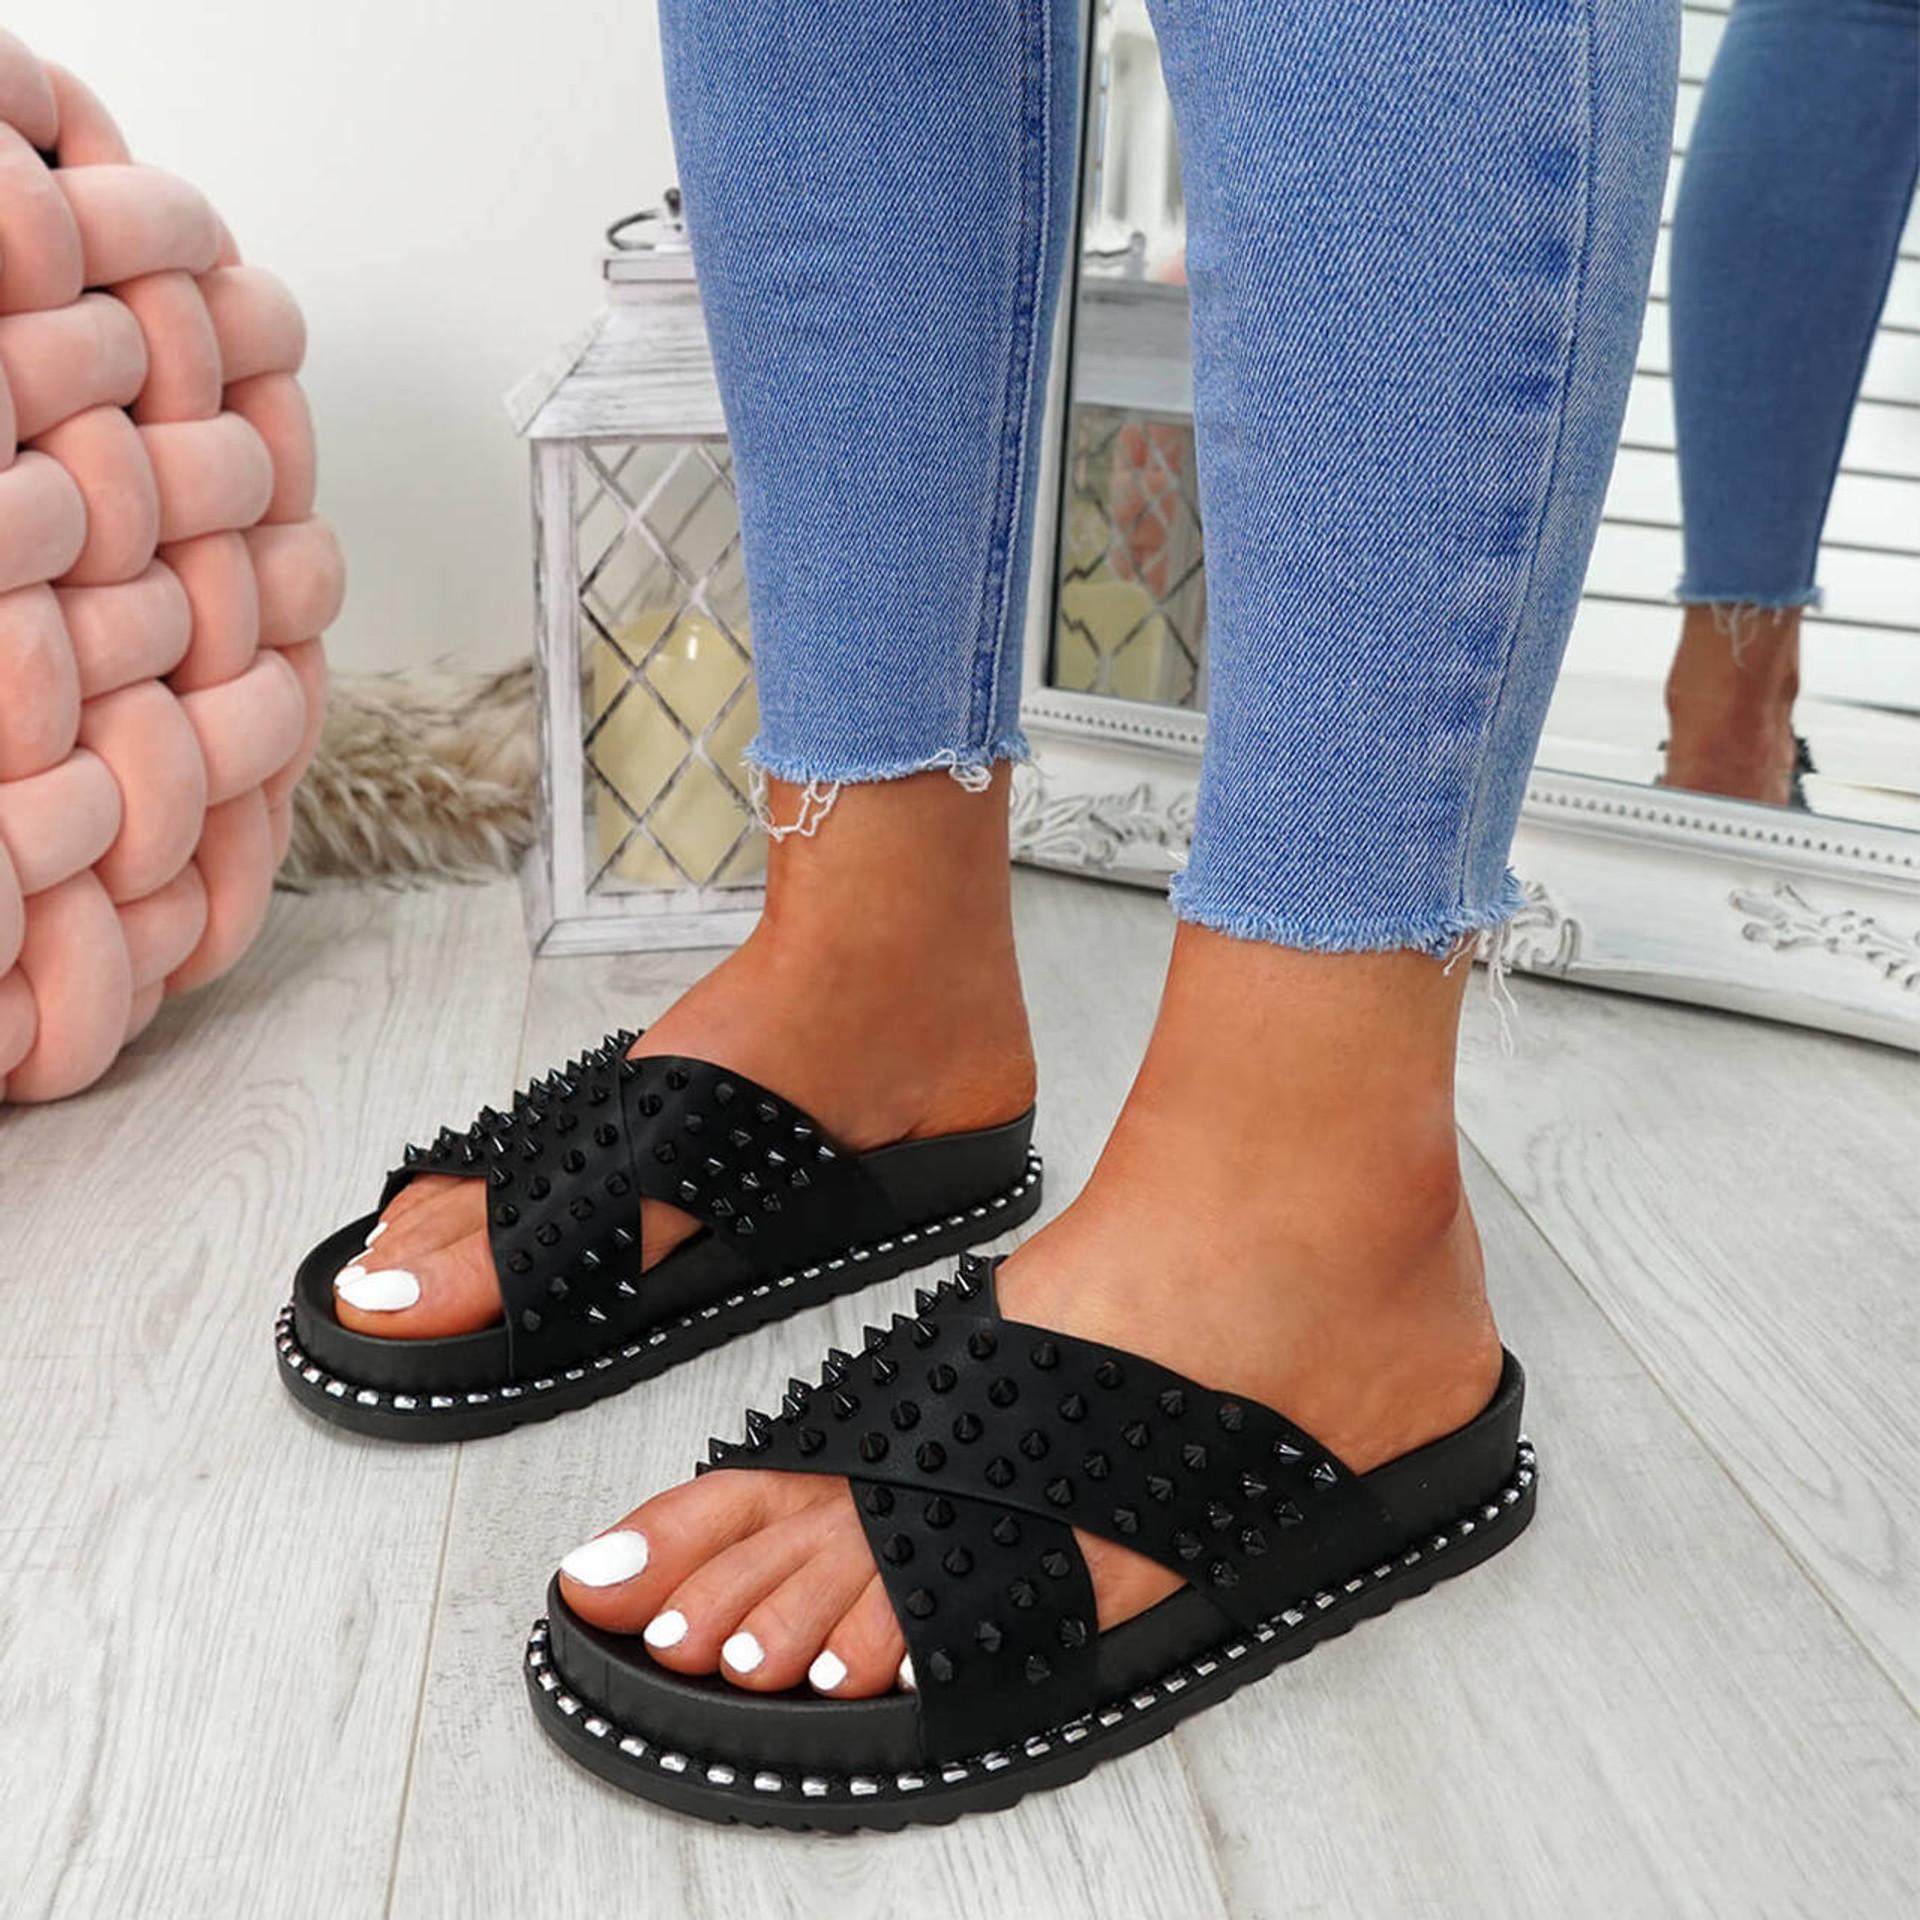 Waya Black Spike Stud Flat Sandals